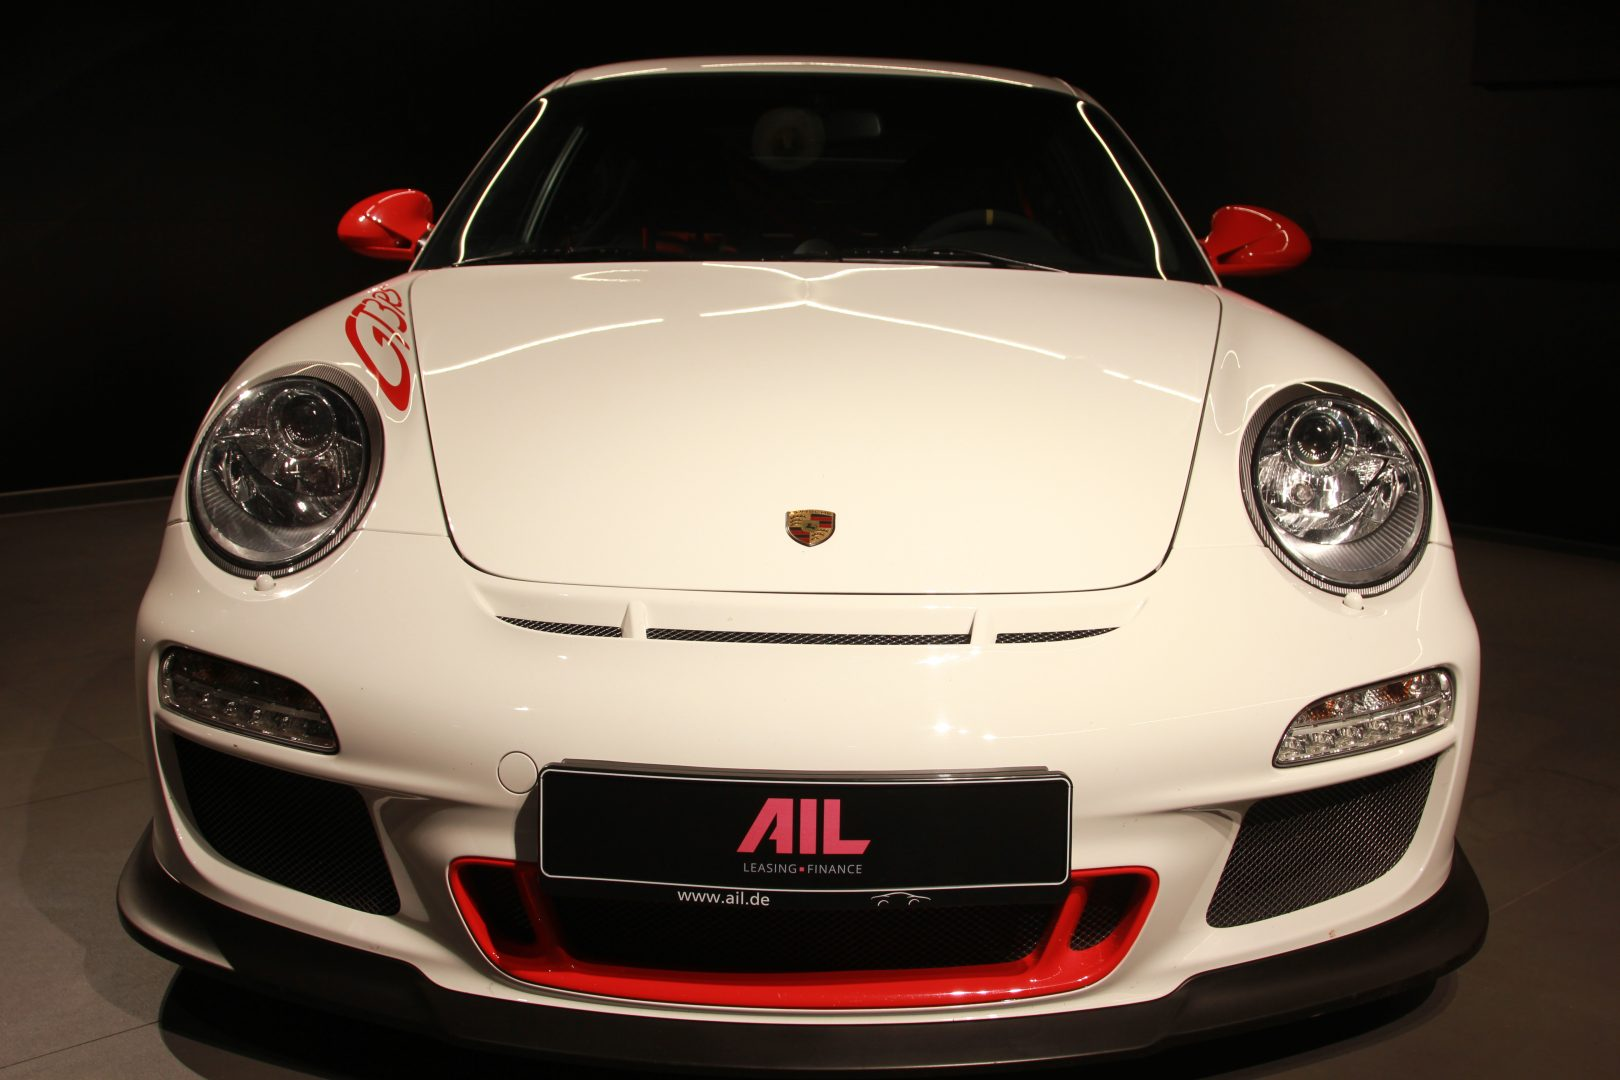 AIL Porsche 911 997 GT3 RS Club Sport Paket 1